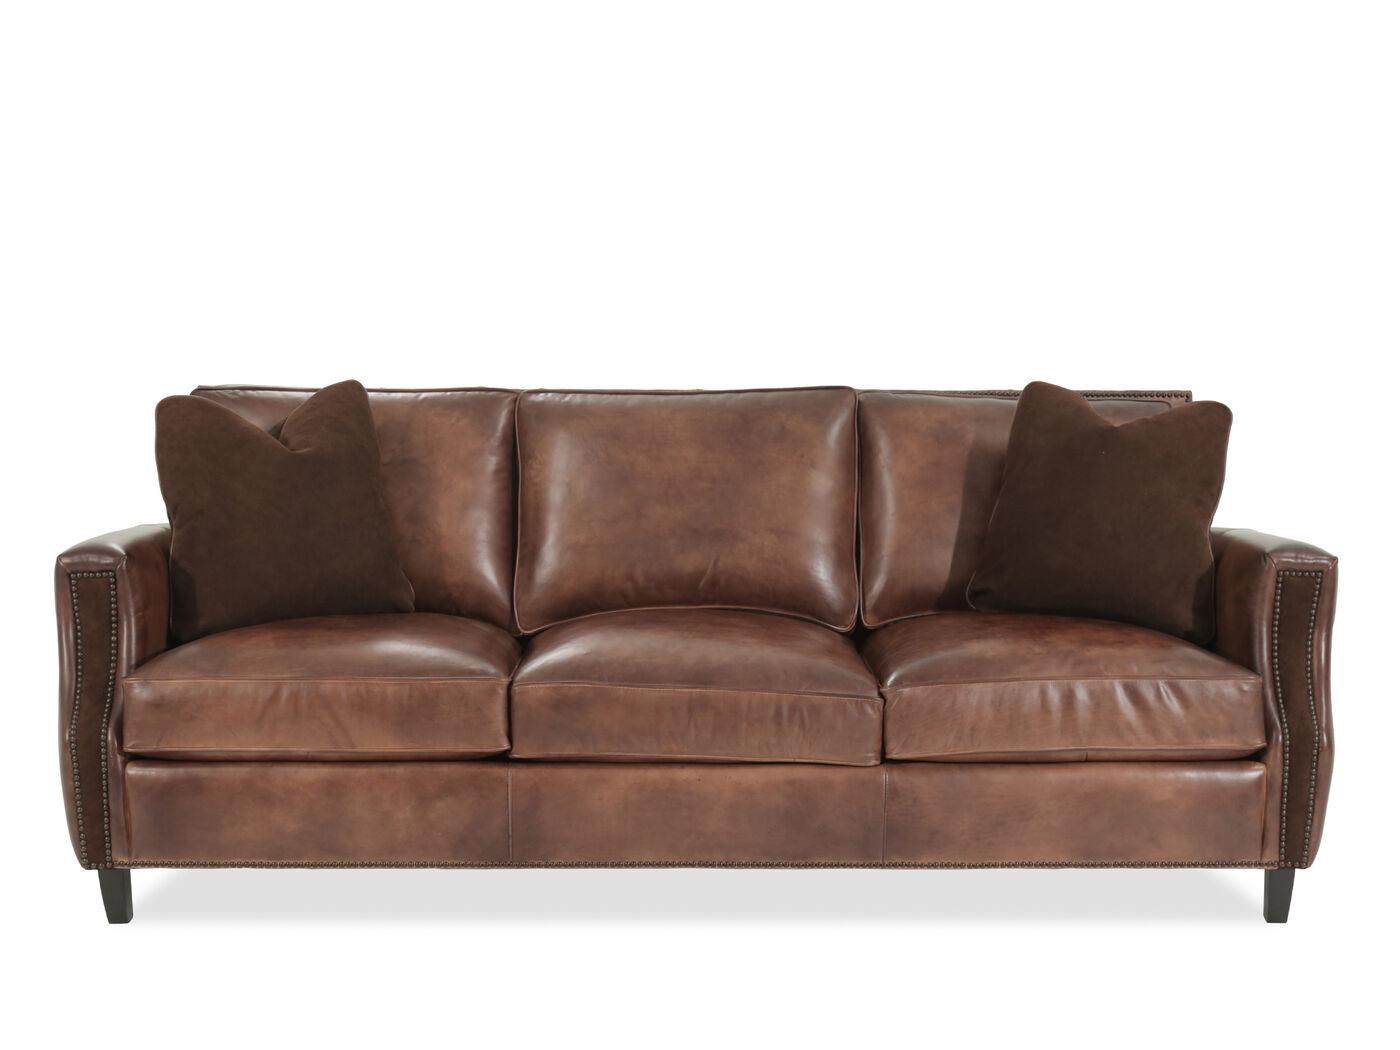 Bernhardt Normandy Leather Brown Sofa